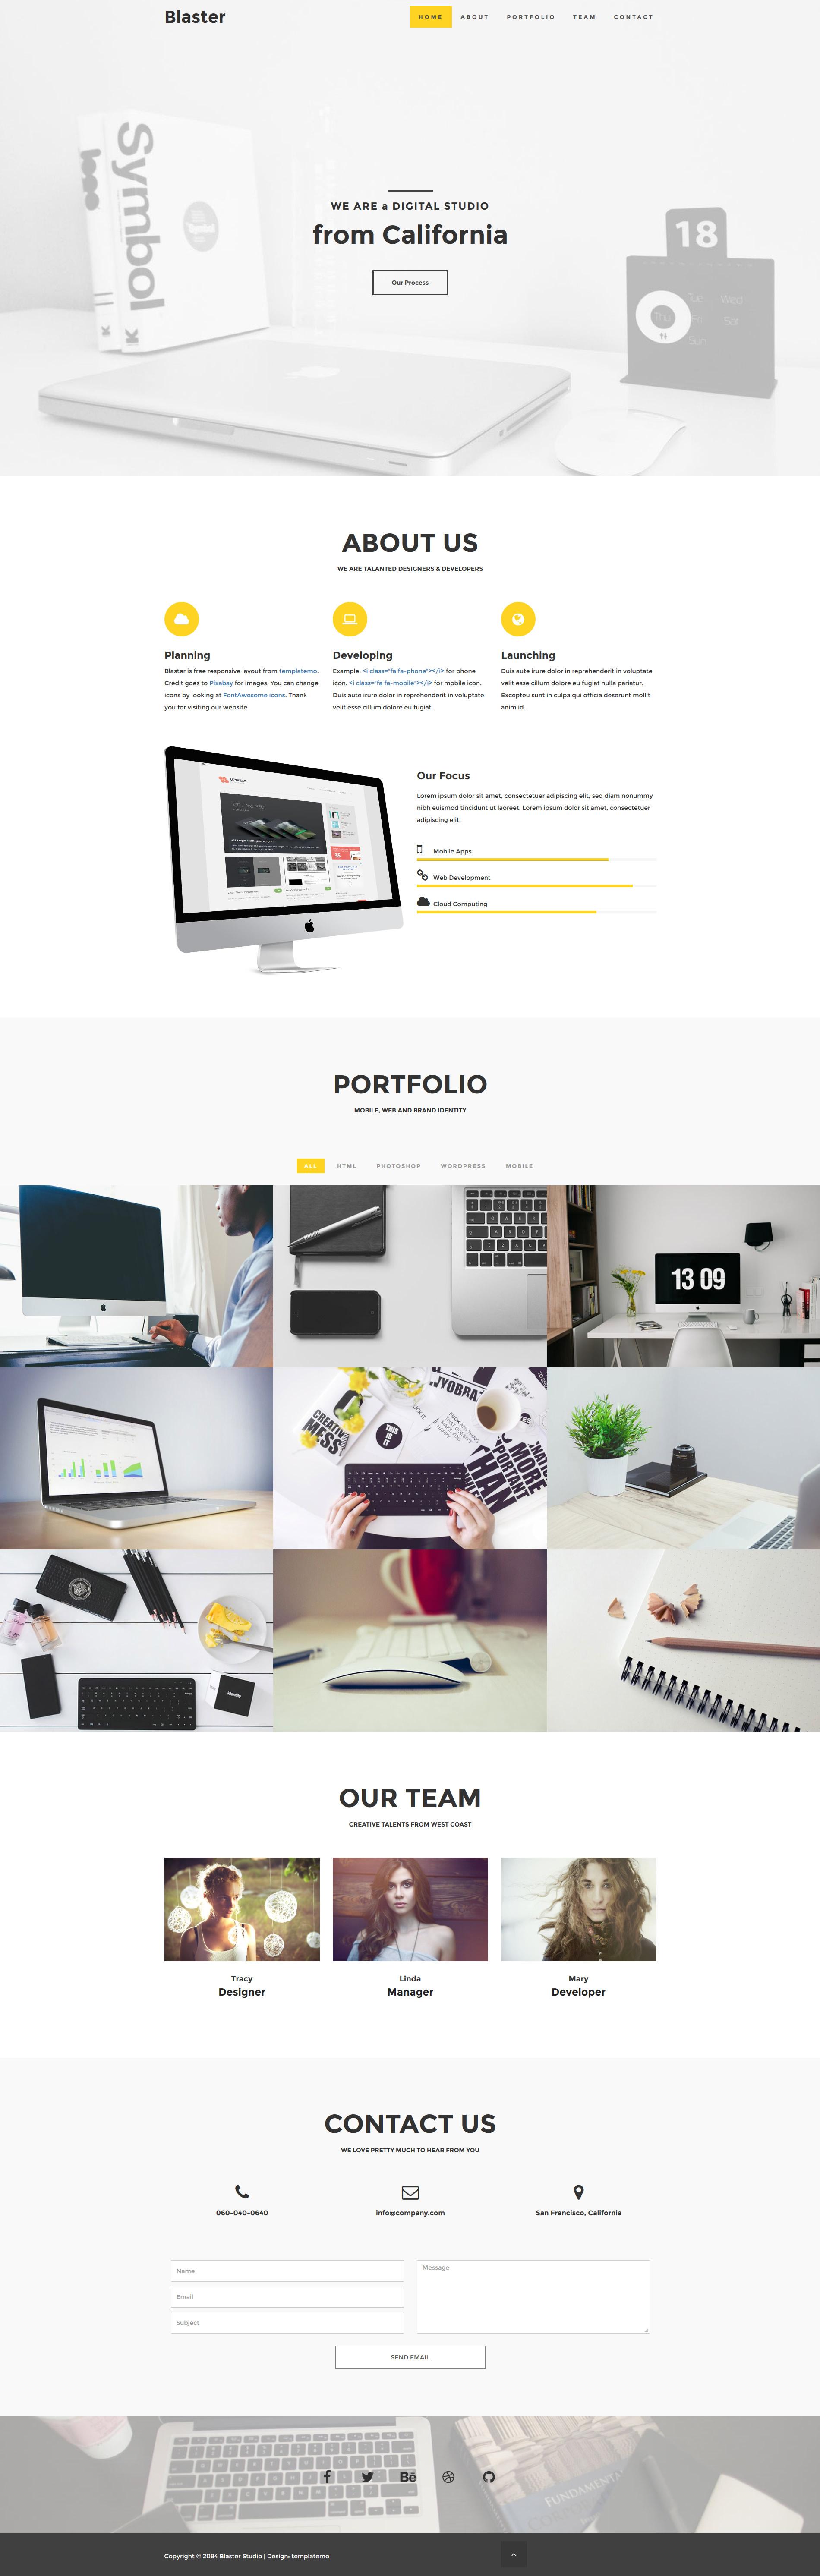 Blaster template | Free html templates | Pinterest | Template